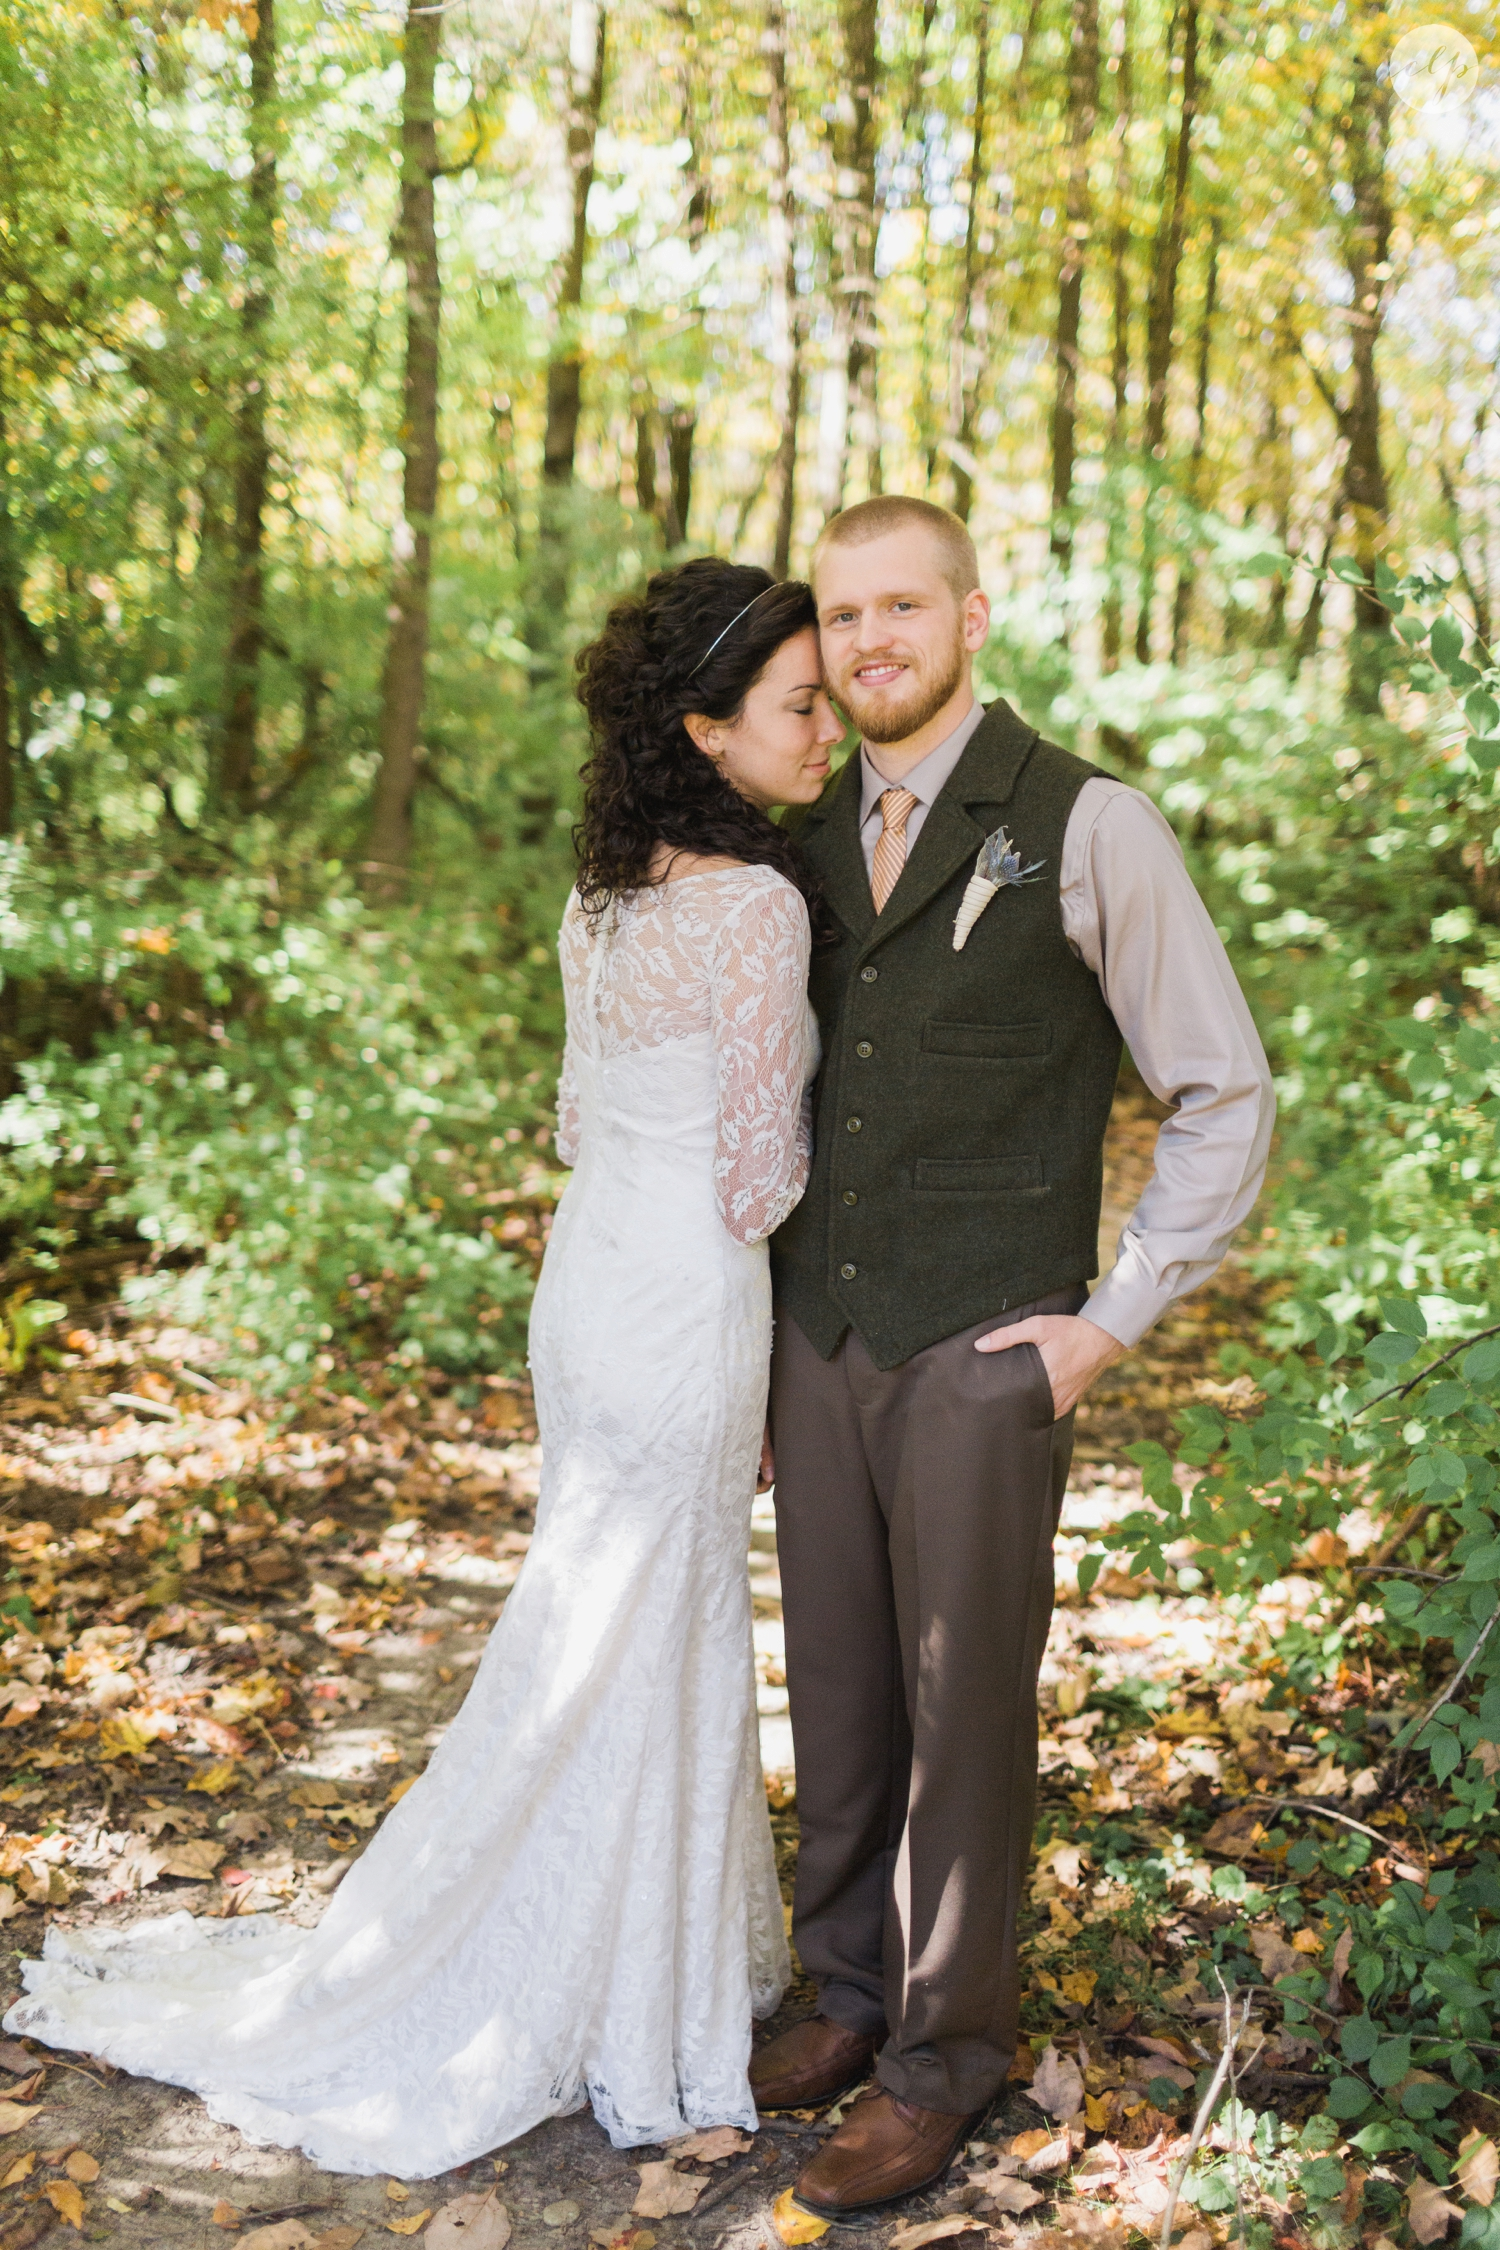 Outdoor-Wedding-in-the-Woods-Photography_4232.jpg